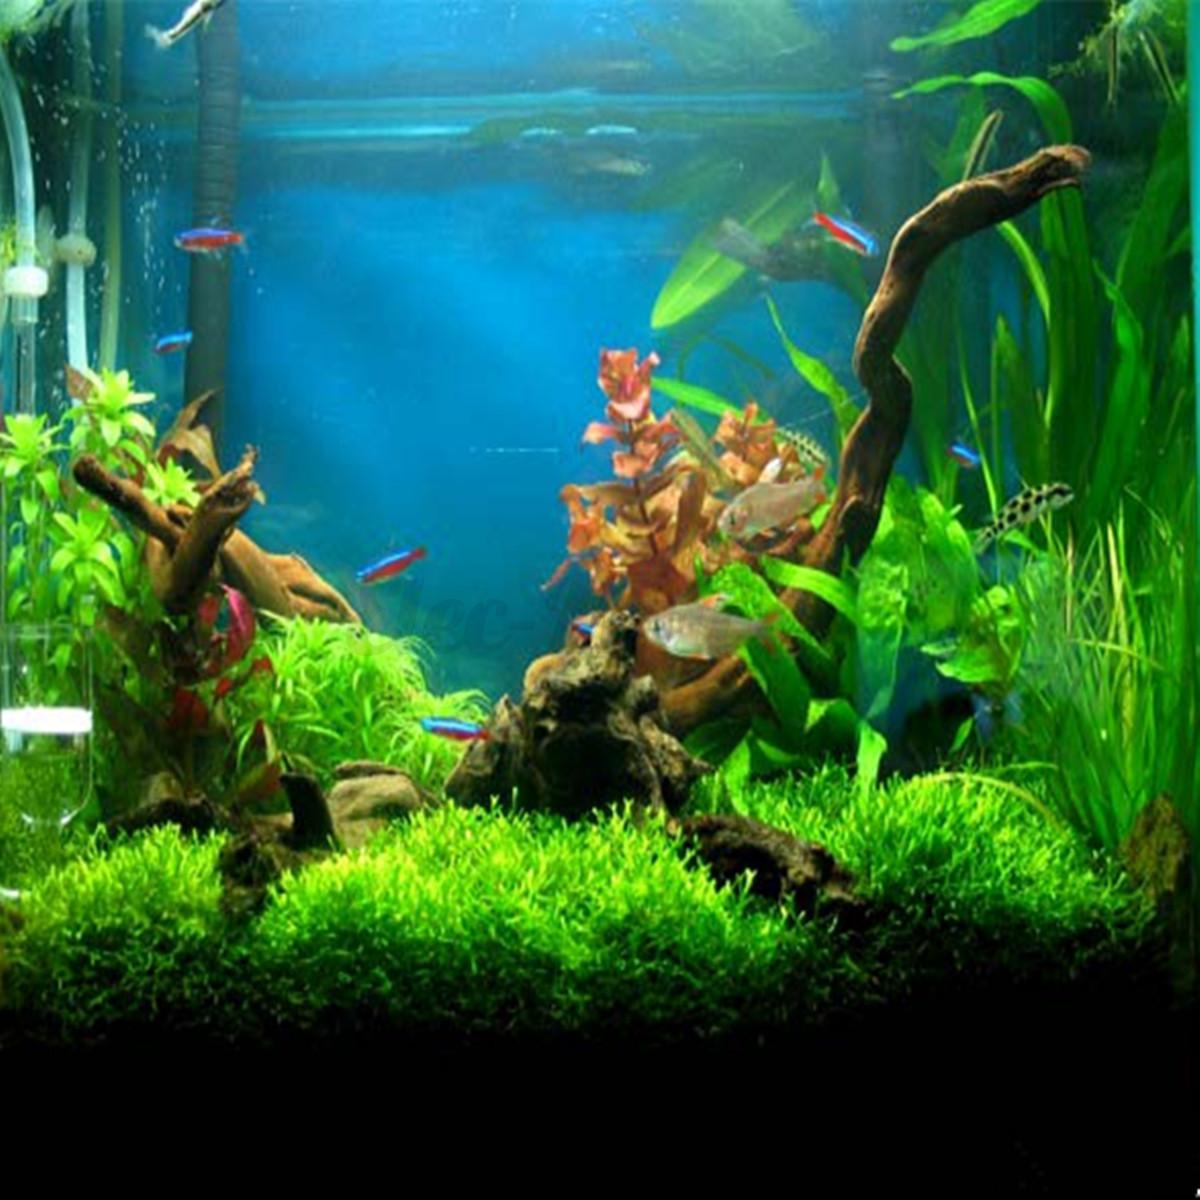 Aquarium fish tank underwater driftwood tree root stump for Fish tank tree